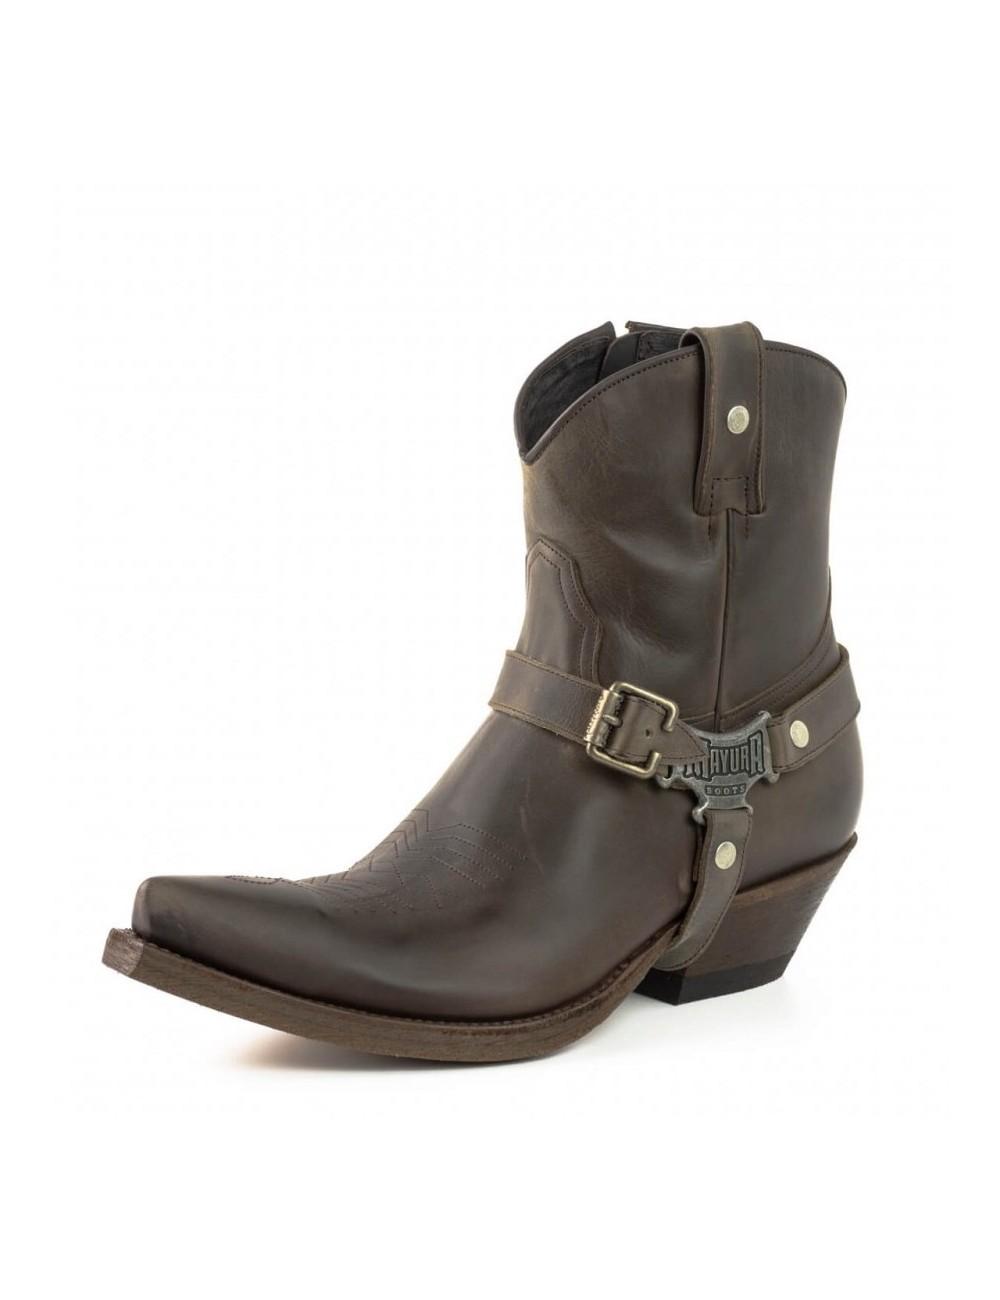 Bottines cowboy cuir marron - Bottines cowboy artisanales